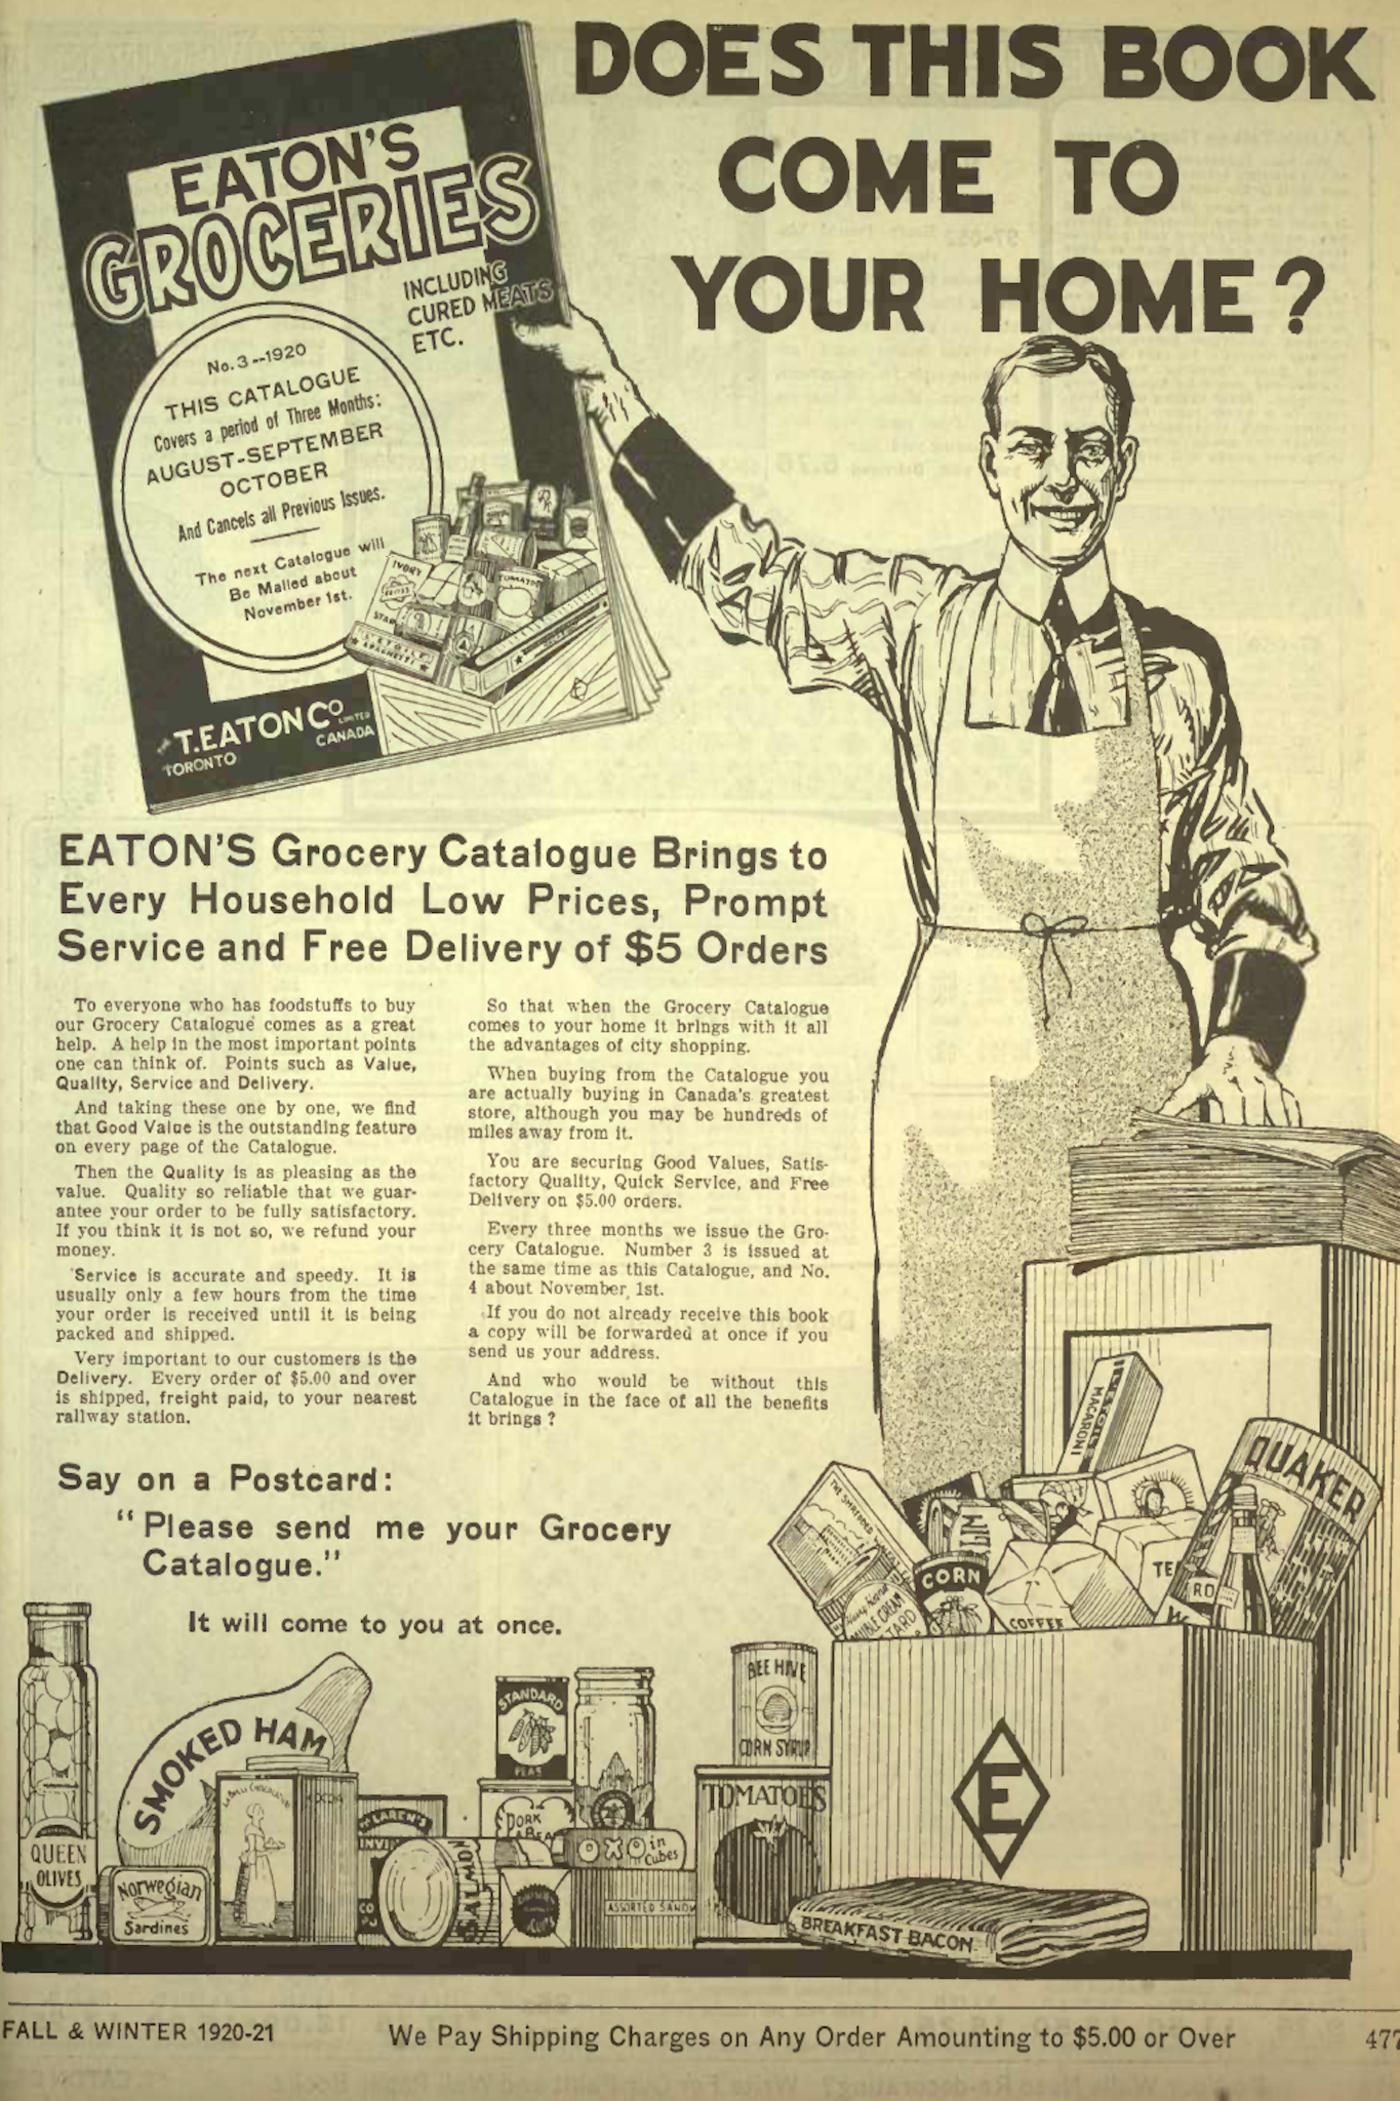 eatons catalogue history